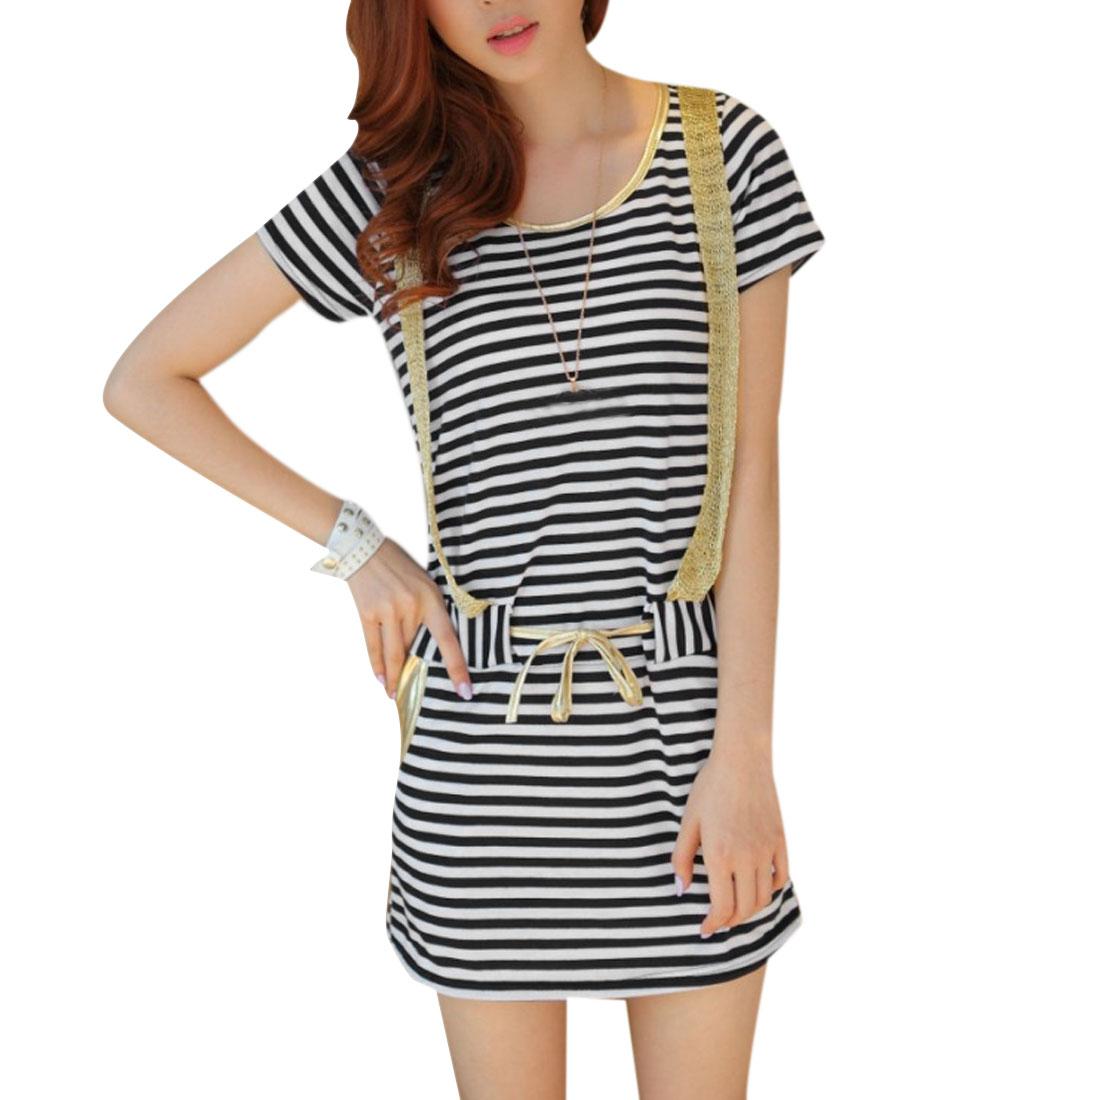 Lady White Black Stripes Self Tie Drawstring Waist Pullover Dress XS